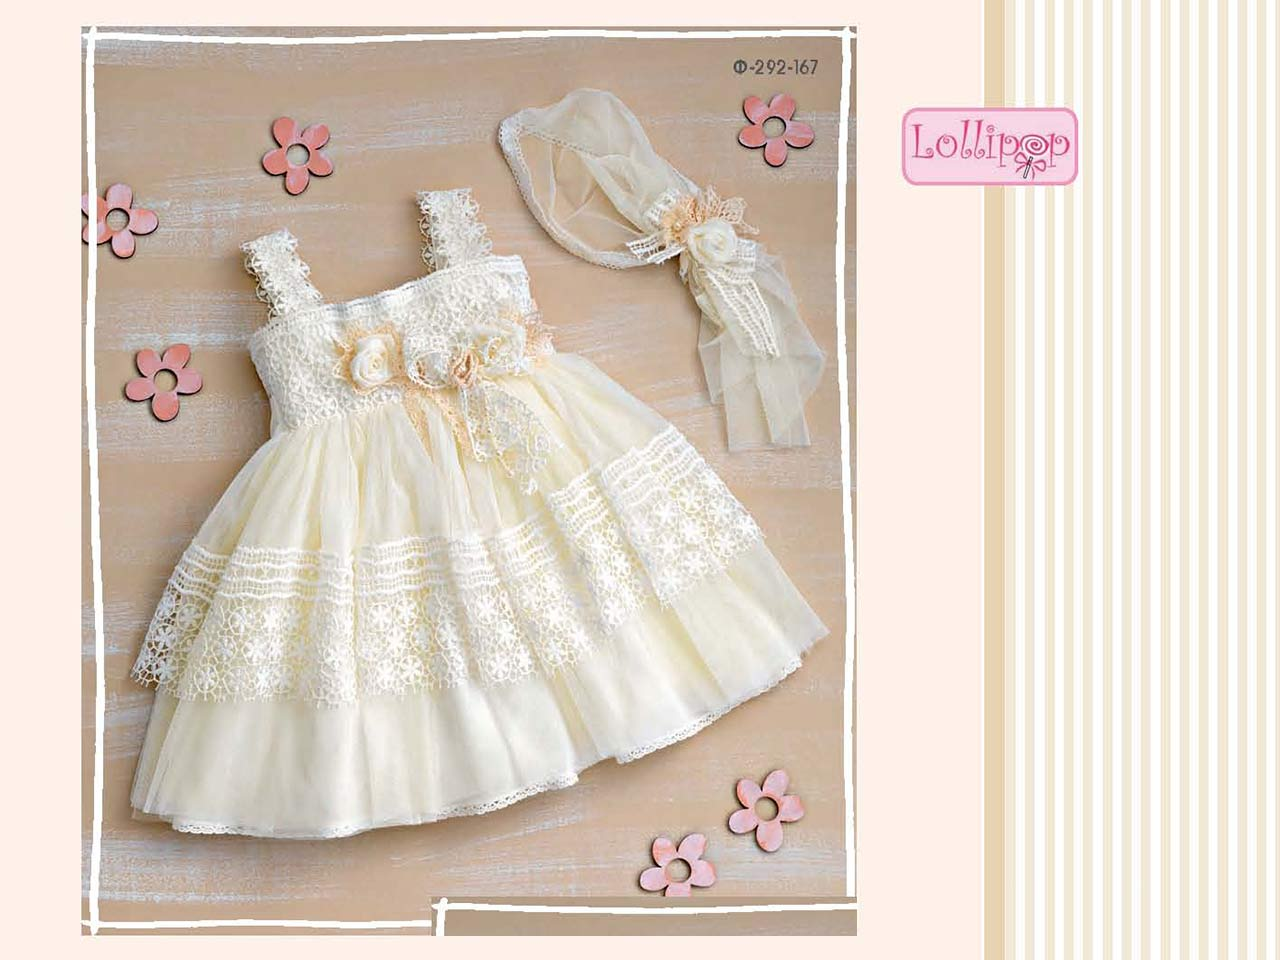 1e750268a61 Βαπτιστικό Φόρεμα Δαντέλα Εκρού και Σομόν- Βαπτιστικό Φόρεμα